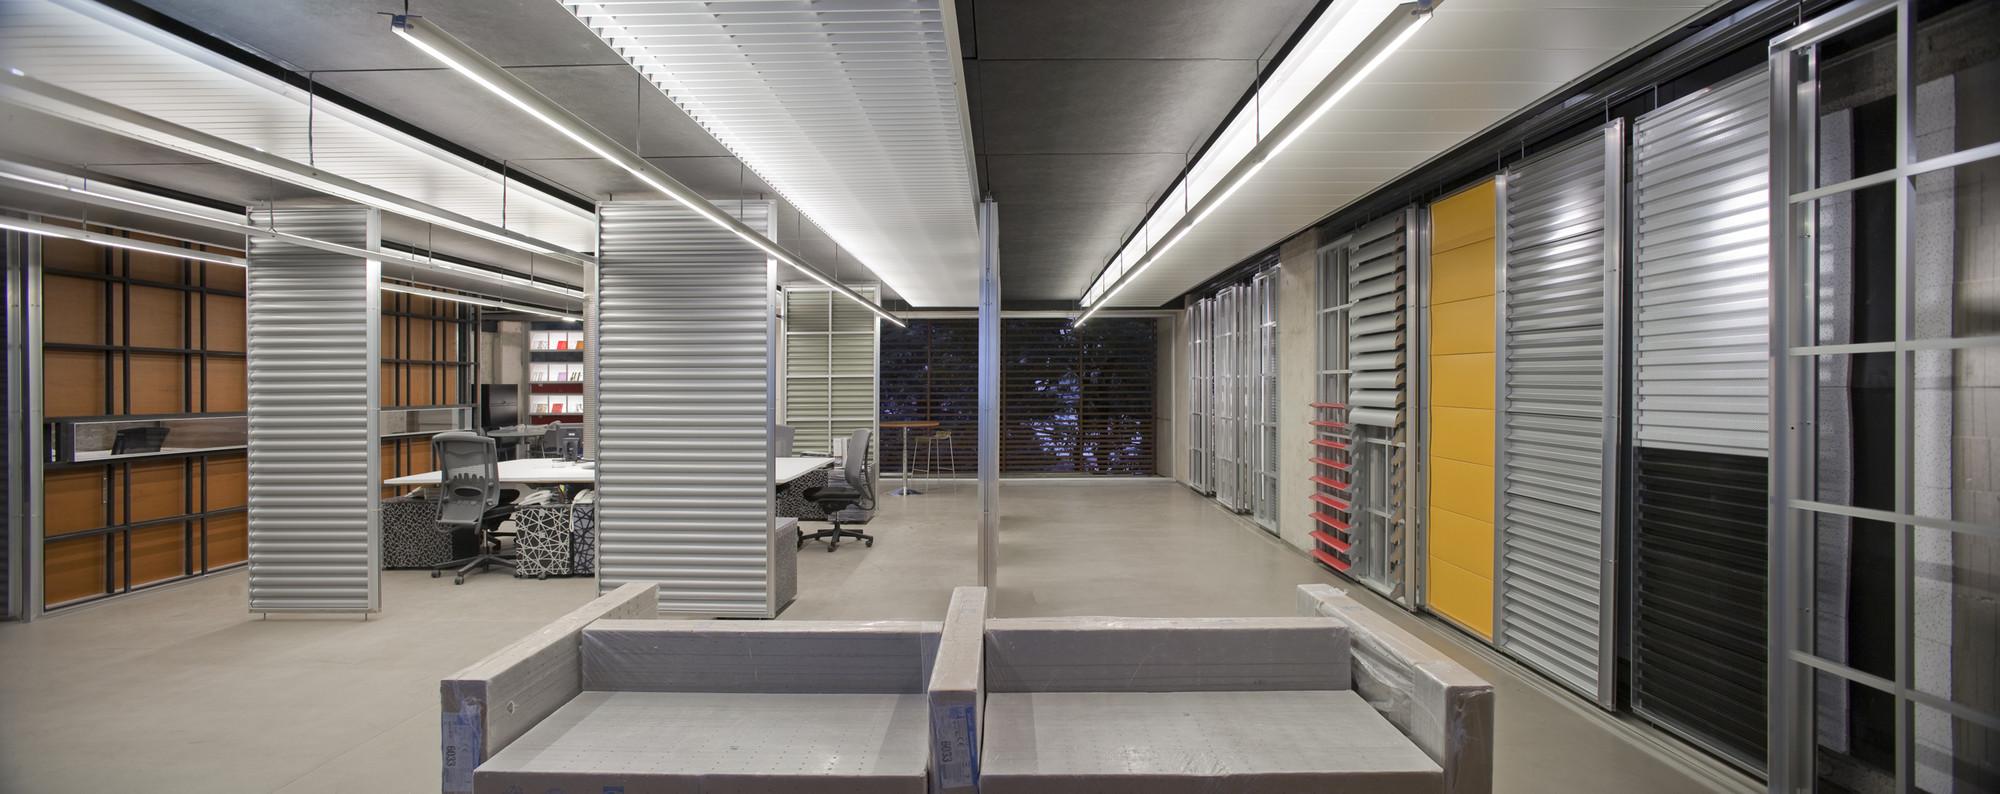 Showroom Hunter Douglas Serrano Monjaraz Arquitectos